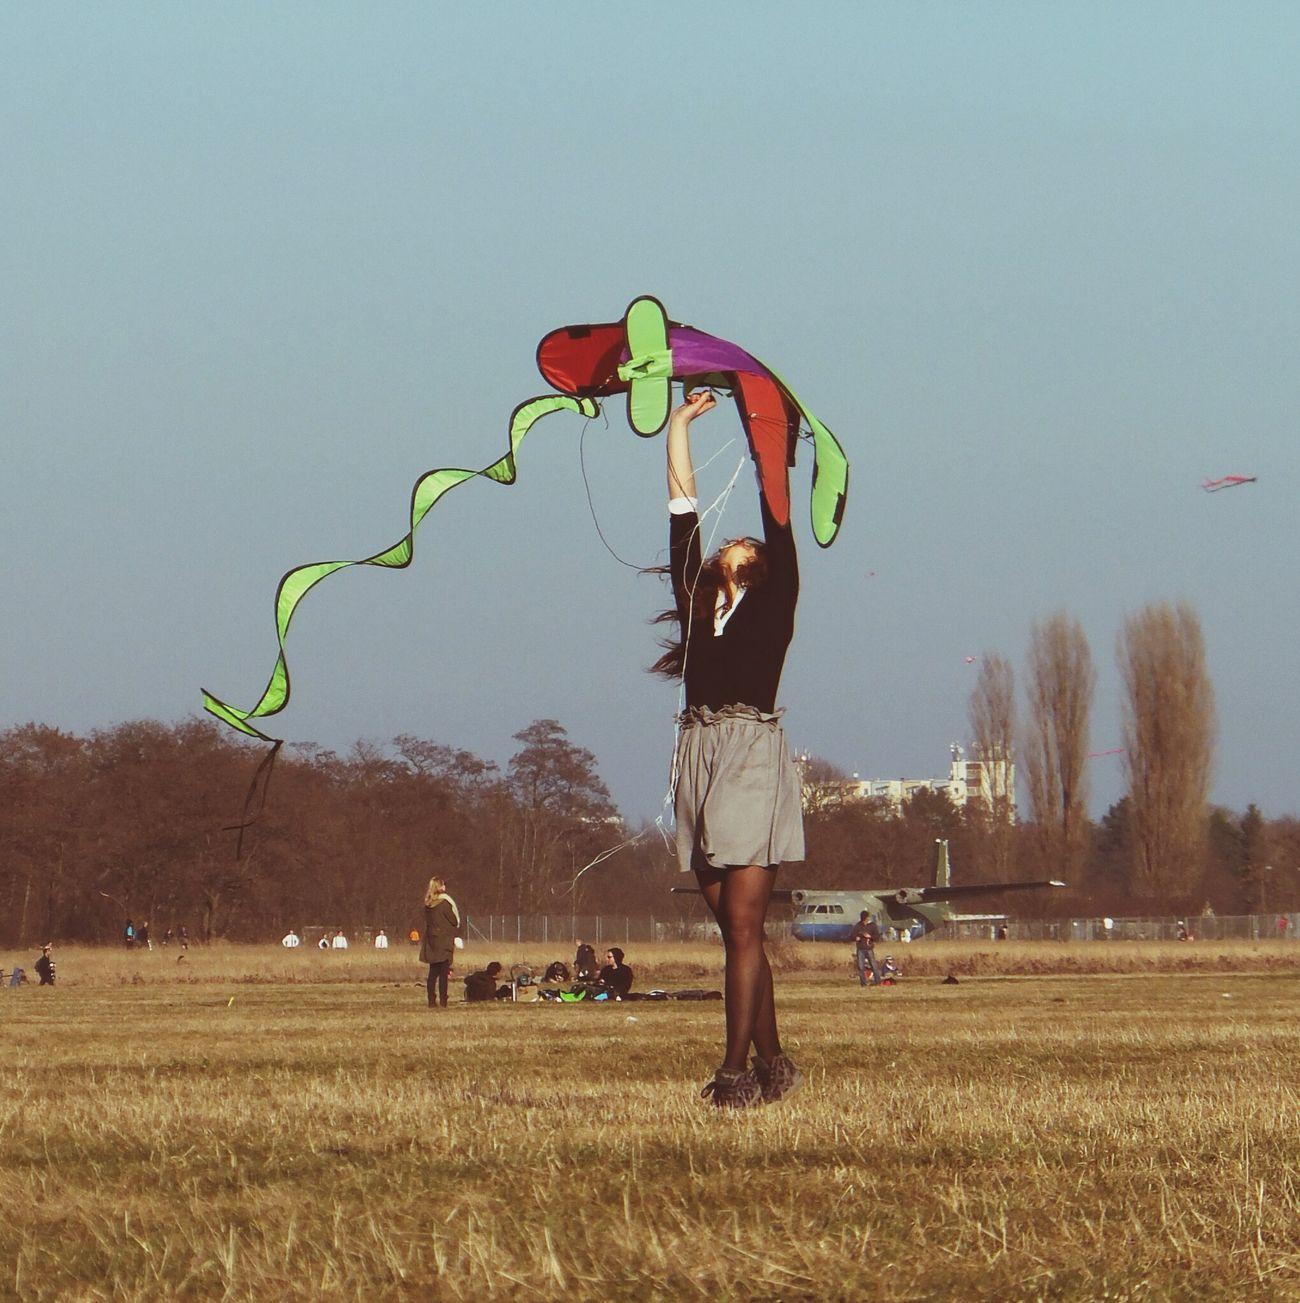 Flying A Kite Enjoying The Sun Sunday Streetphotography